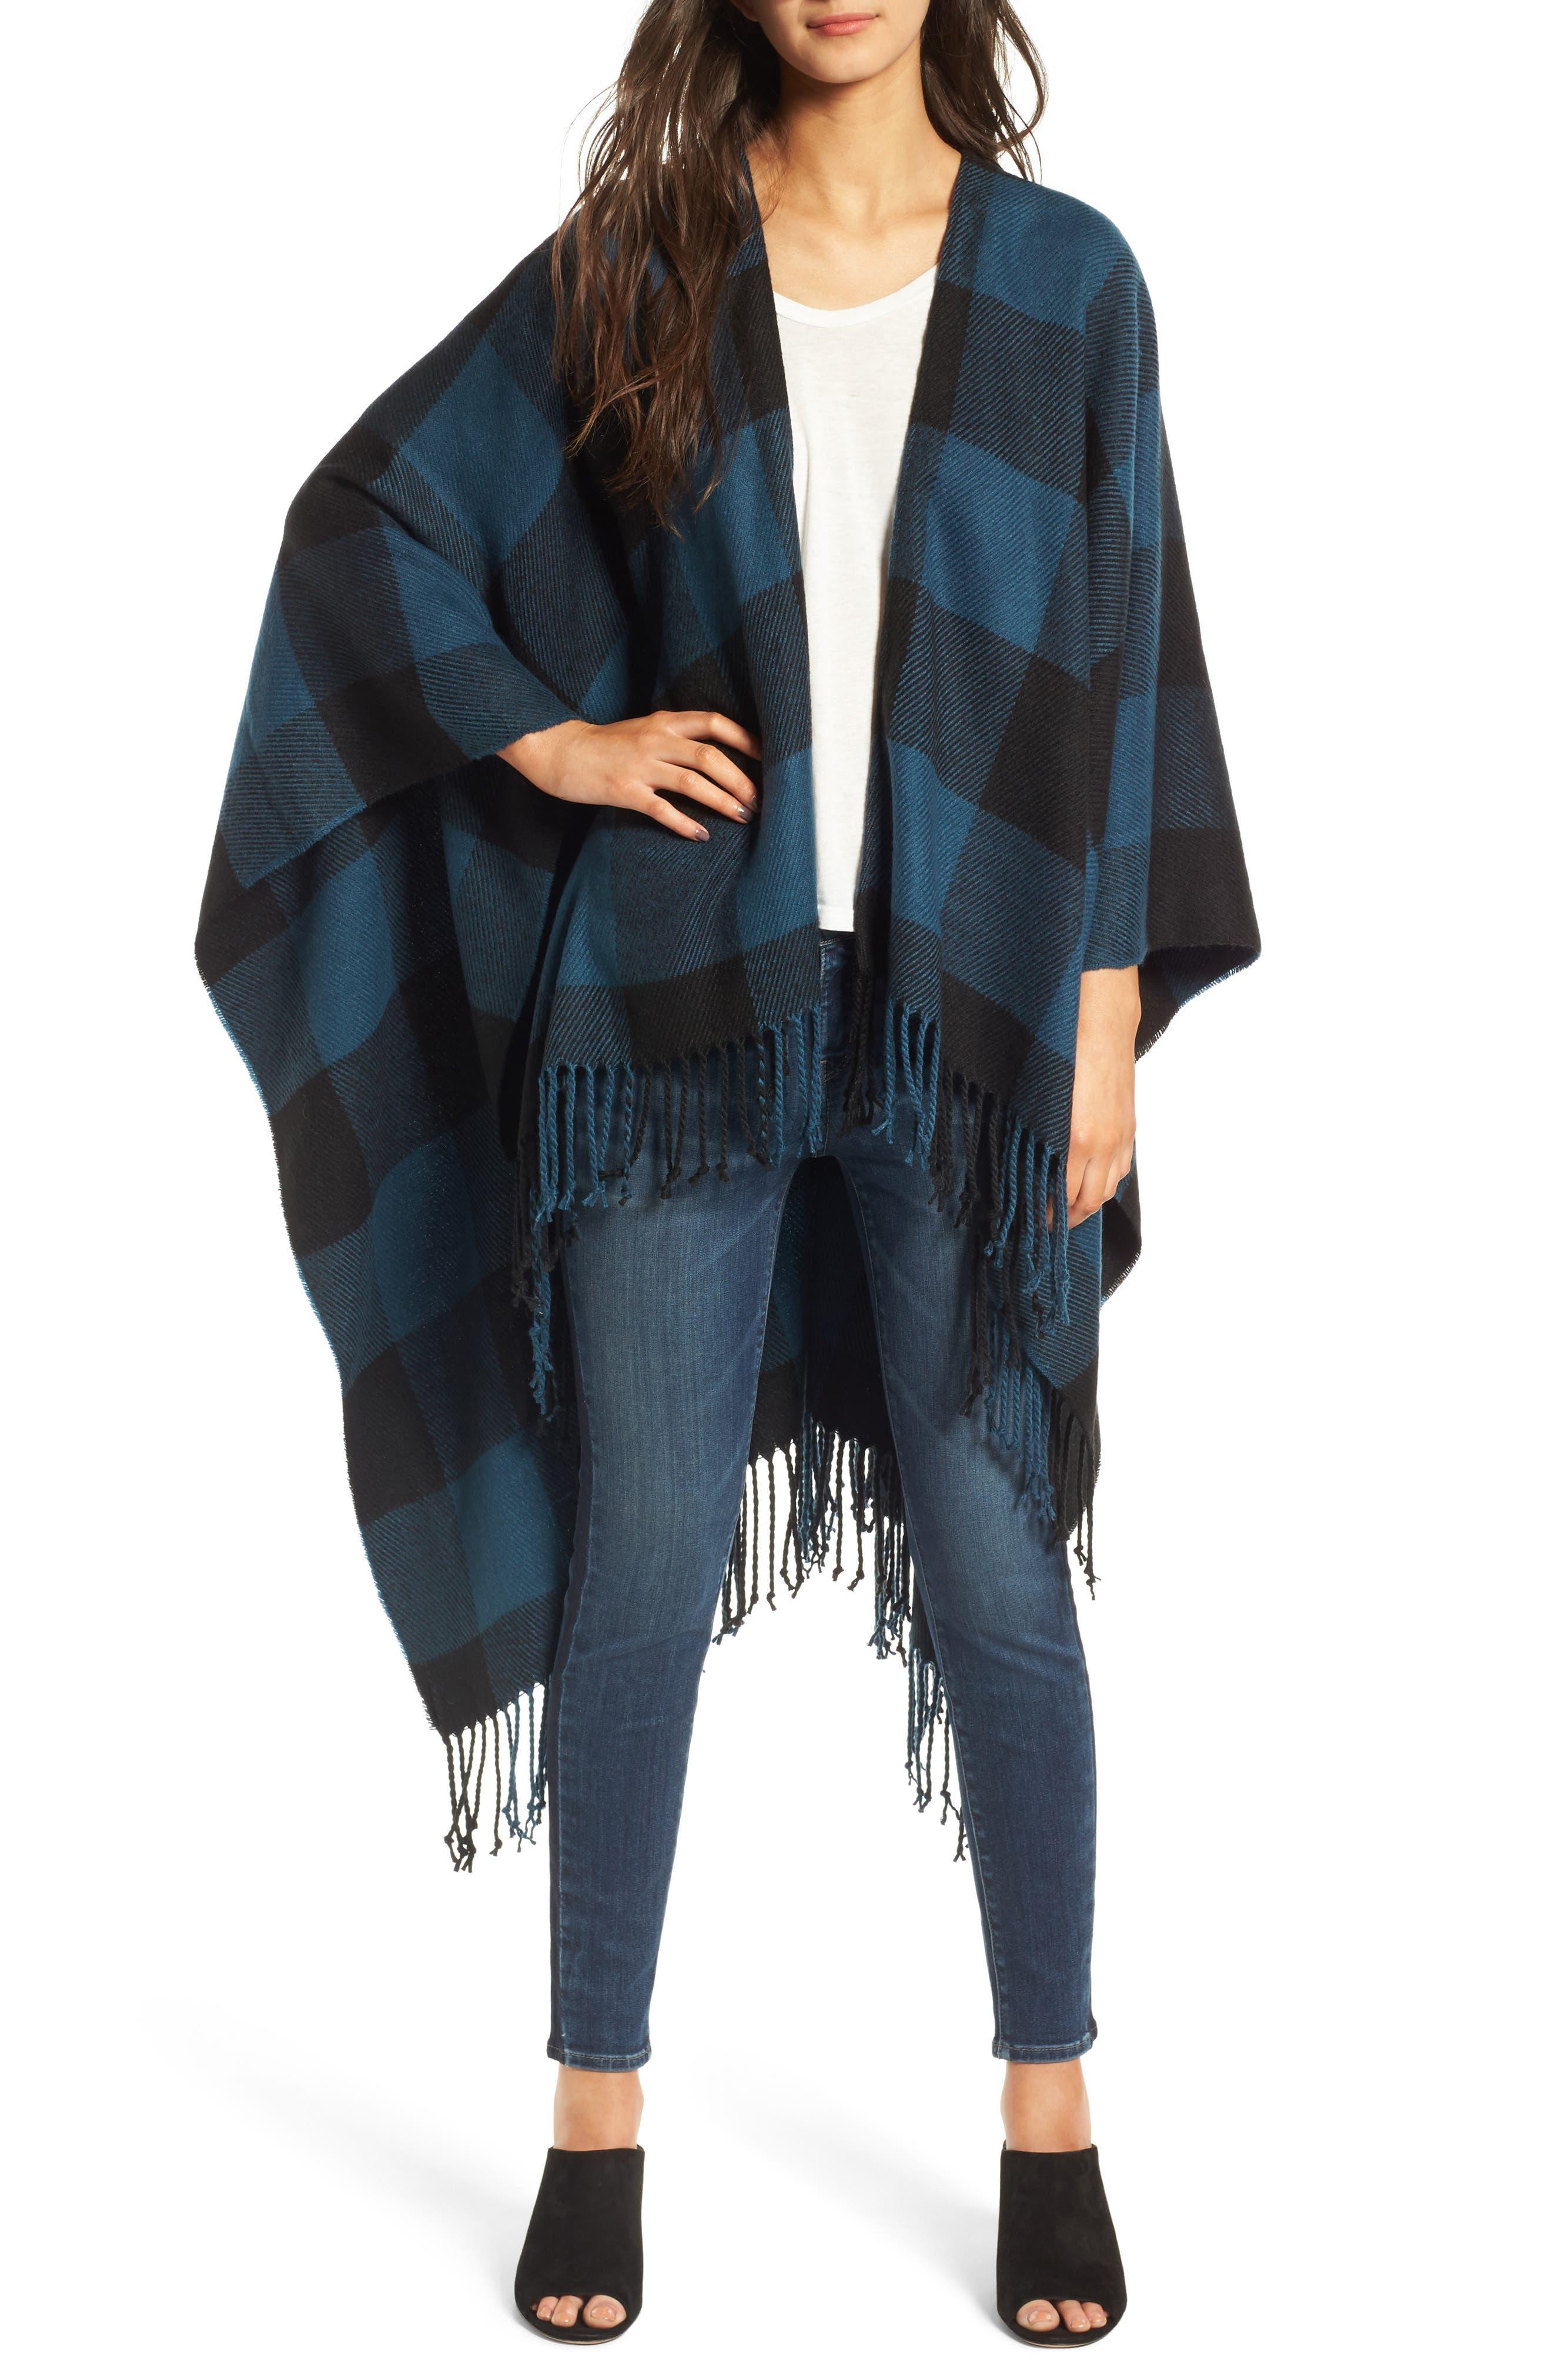 Woven Buffalo Check Ruana,                         Main,                         color, Blue Combo